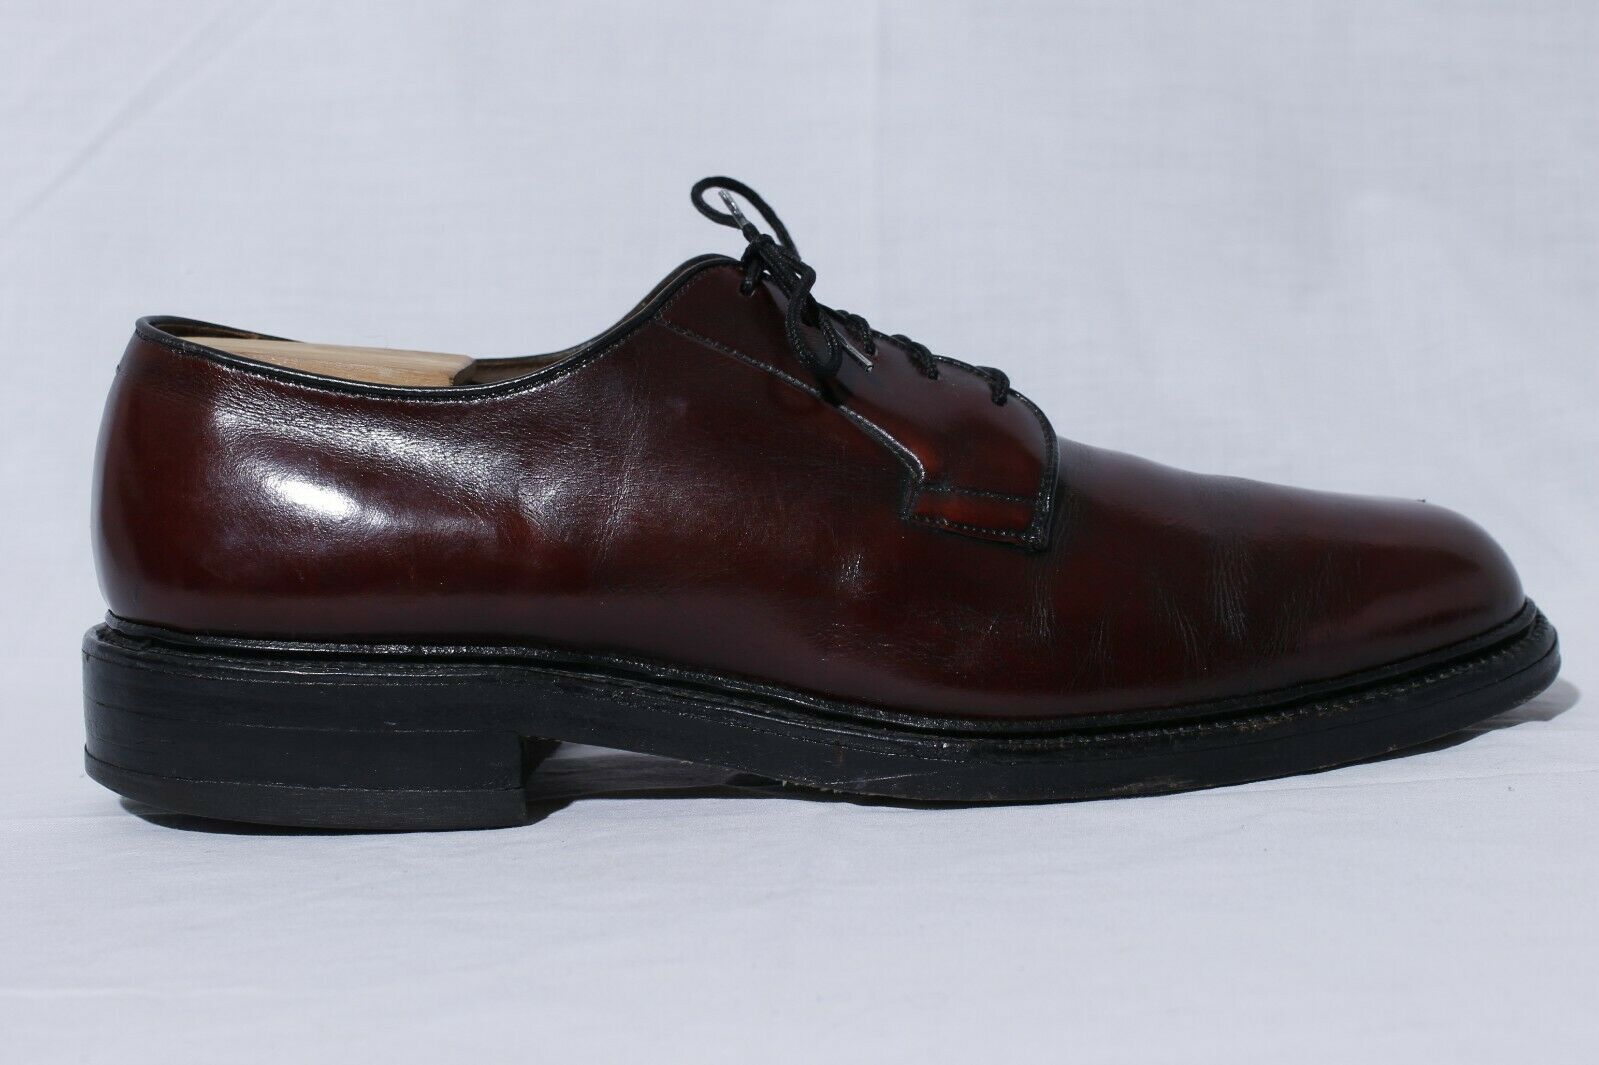 Allen Edmonds Leeds Men's Burgundy Leather Oxford bluecher Dress shoes sz 10A